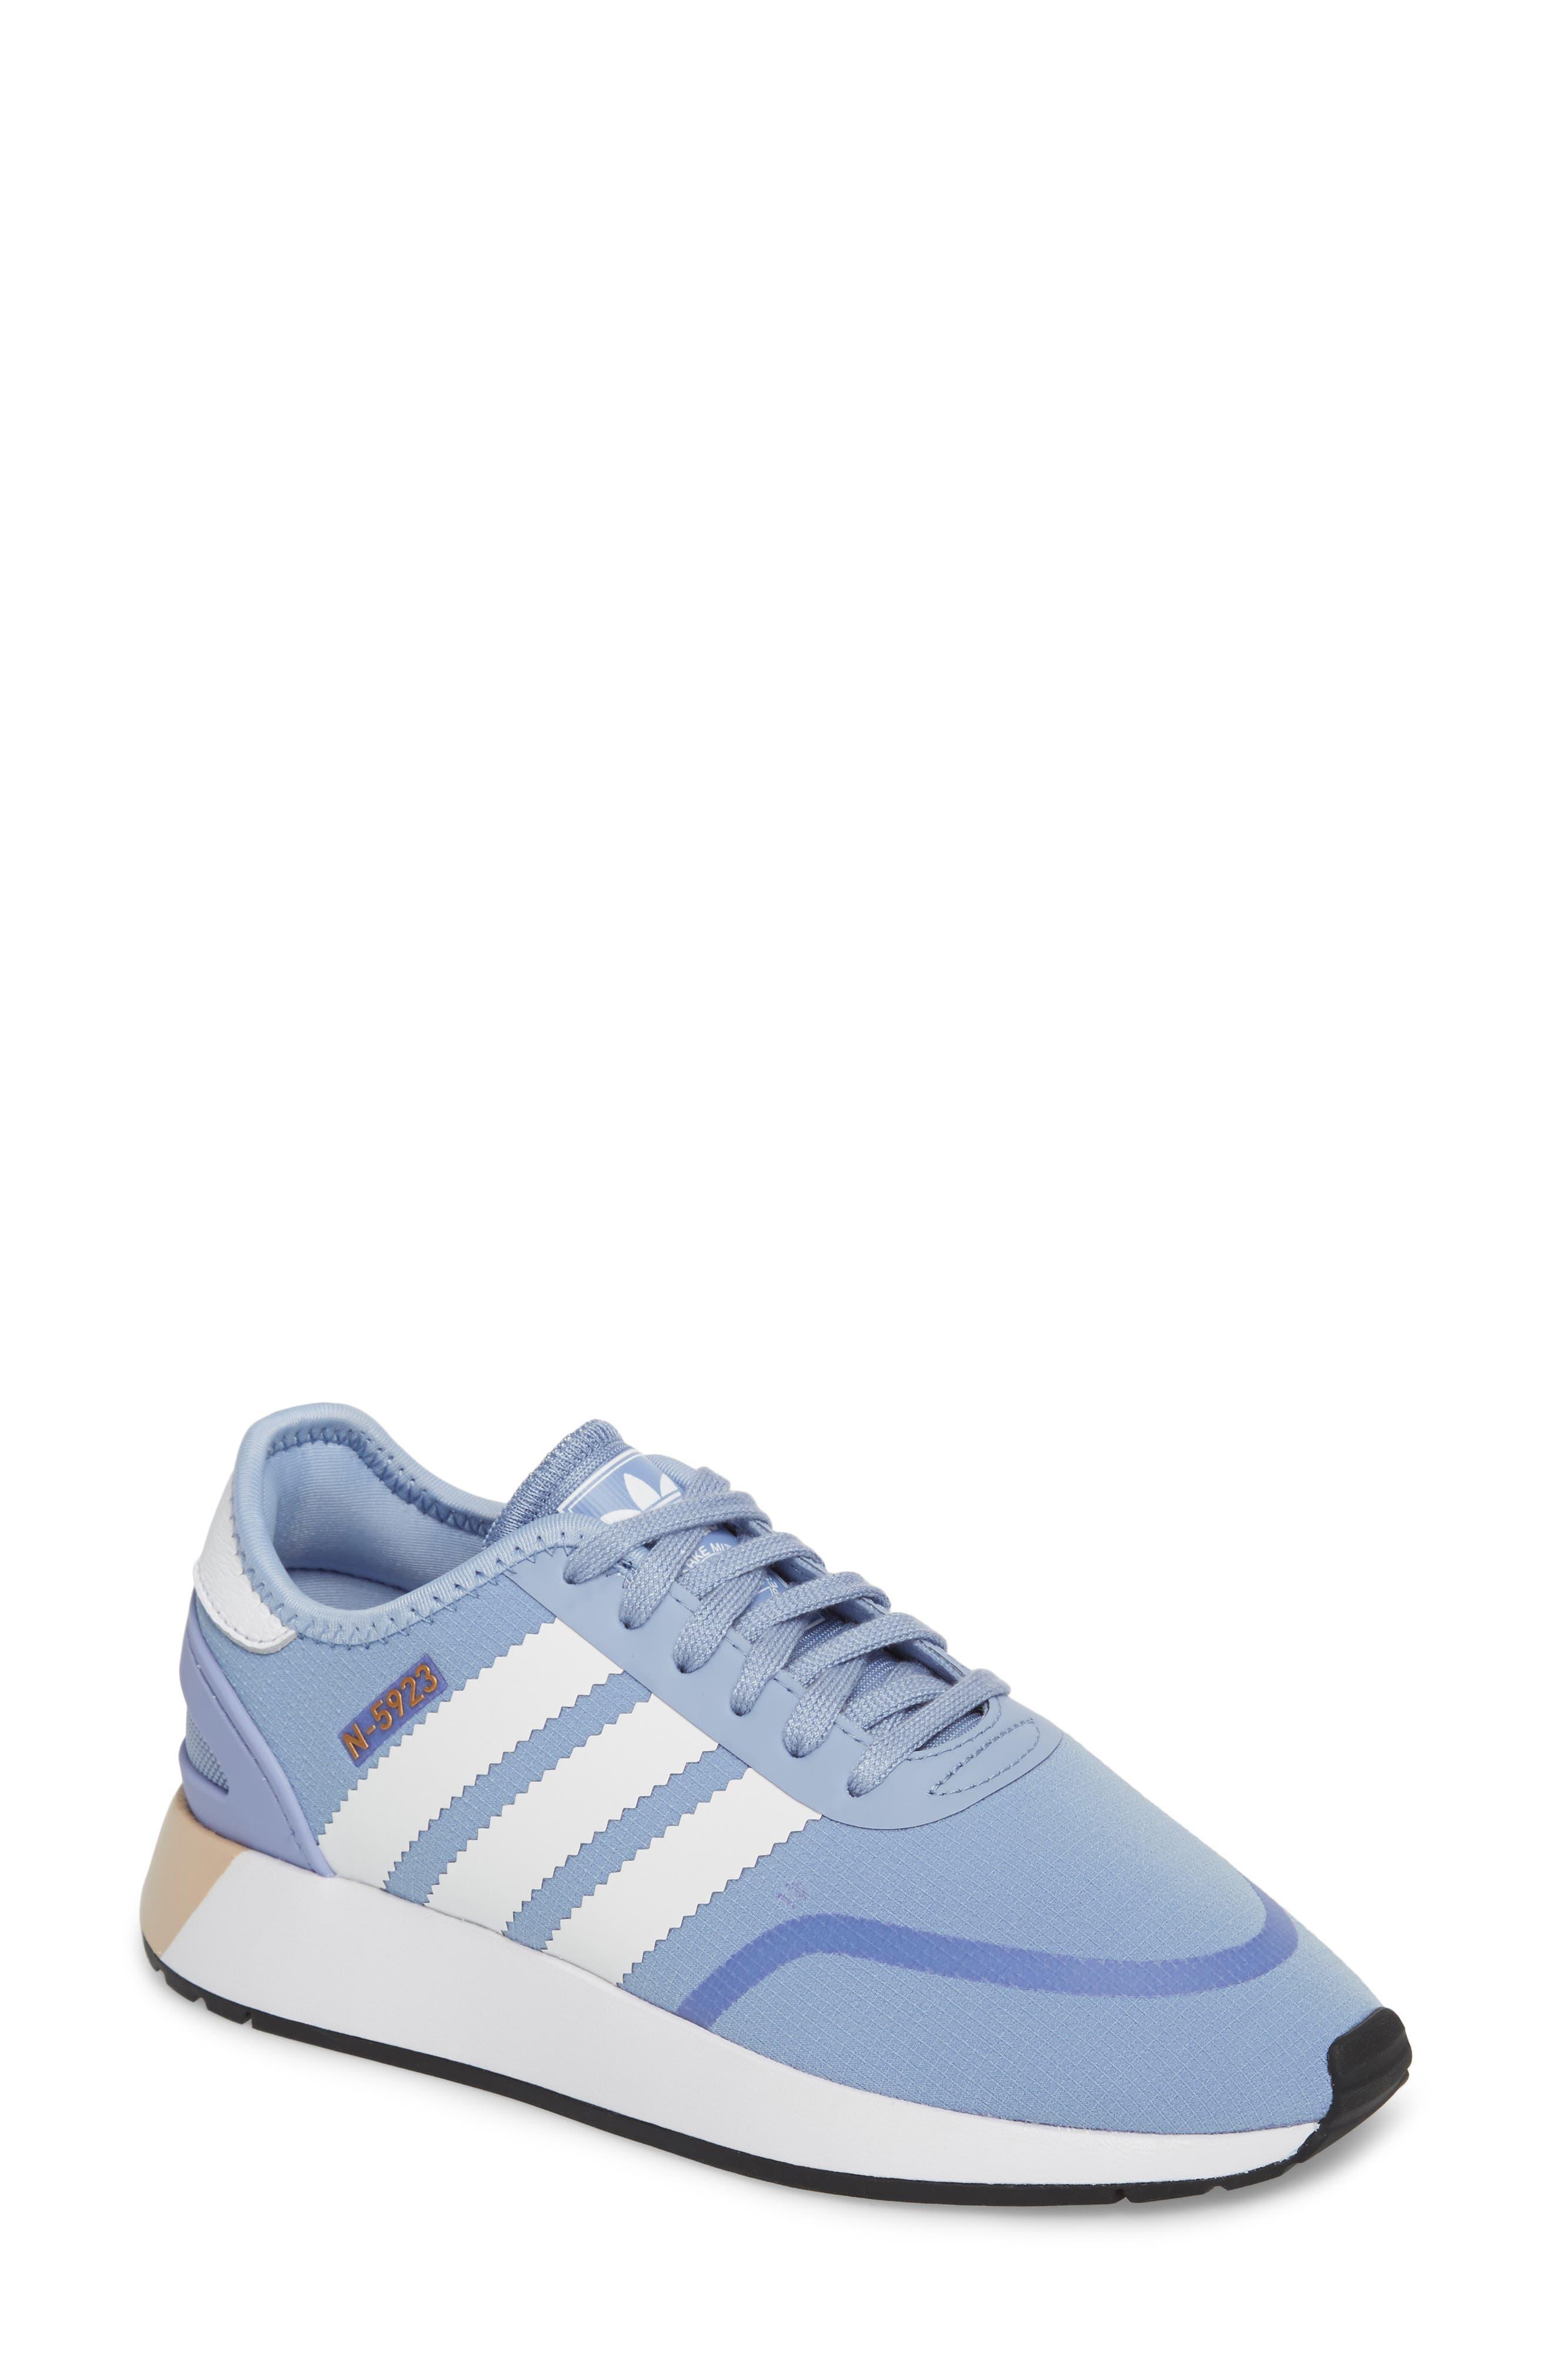 I-5923 Sneaker,                         Main,                         color, Chalk Blue/ White/ White